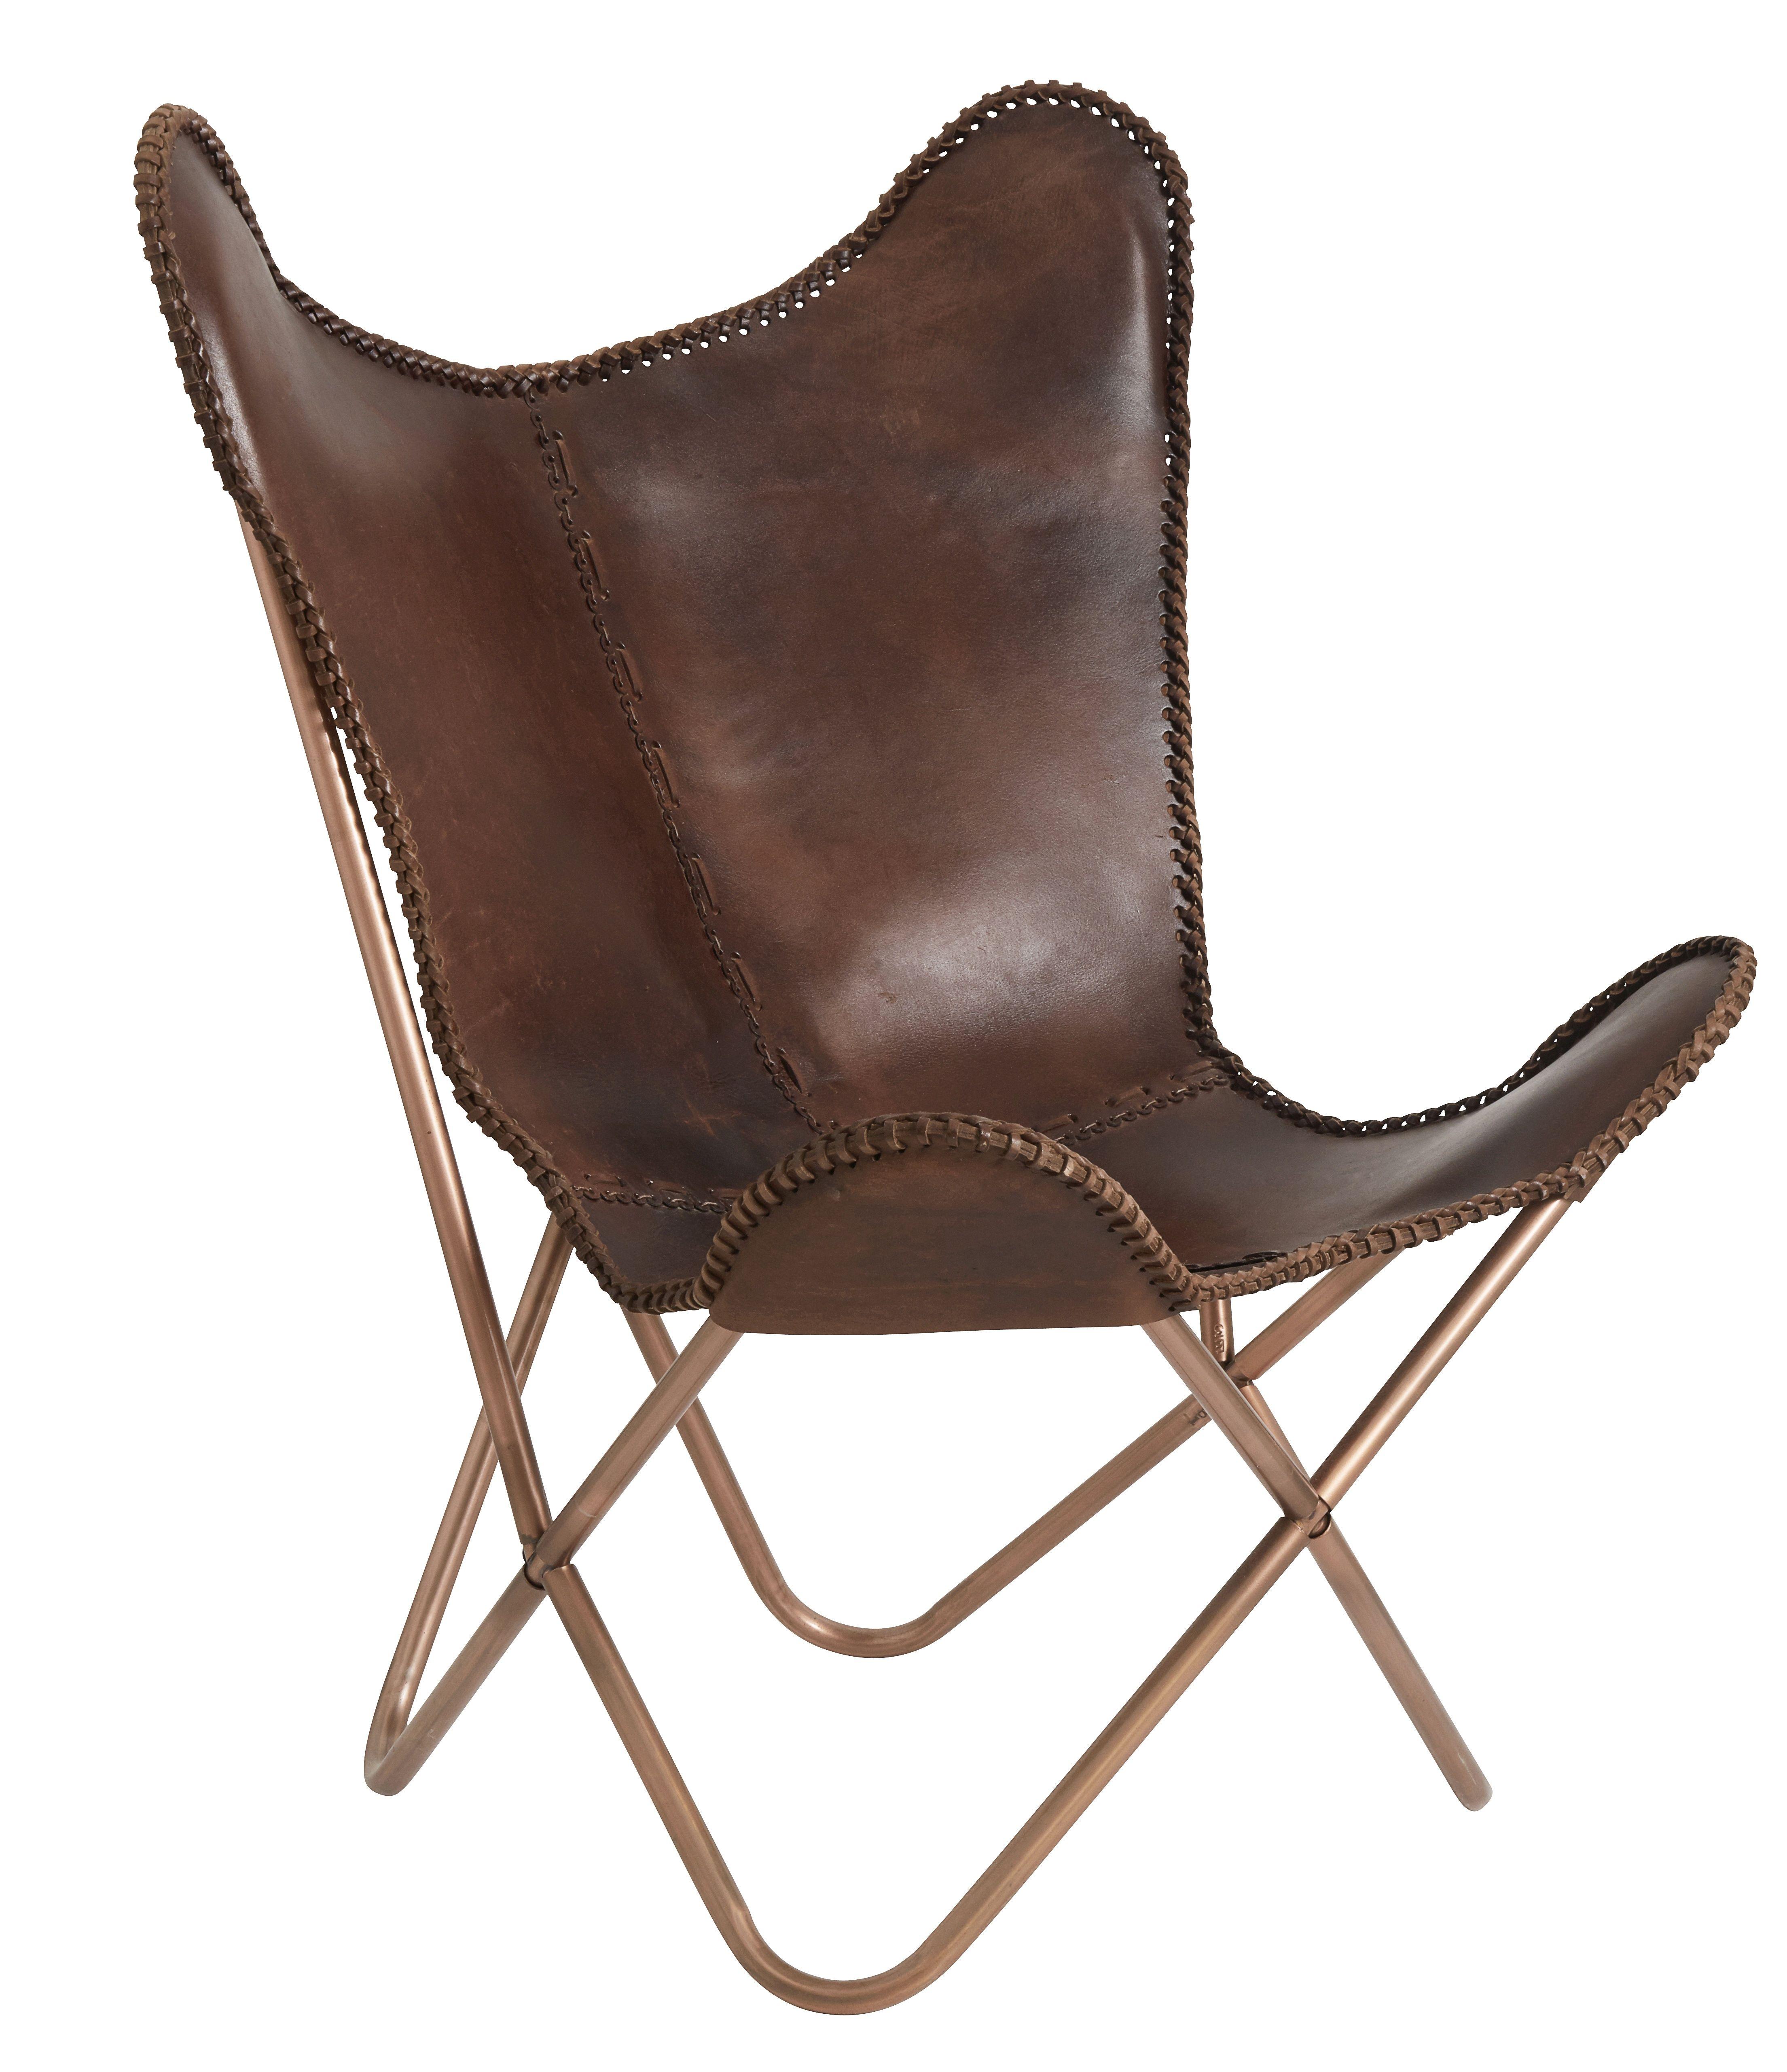 Brown Leather Butterfly Chair Stuhlede Com Schmetterling Stuhl Stuhle Klassiker